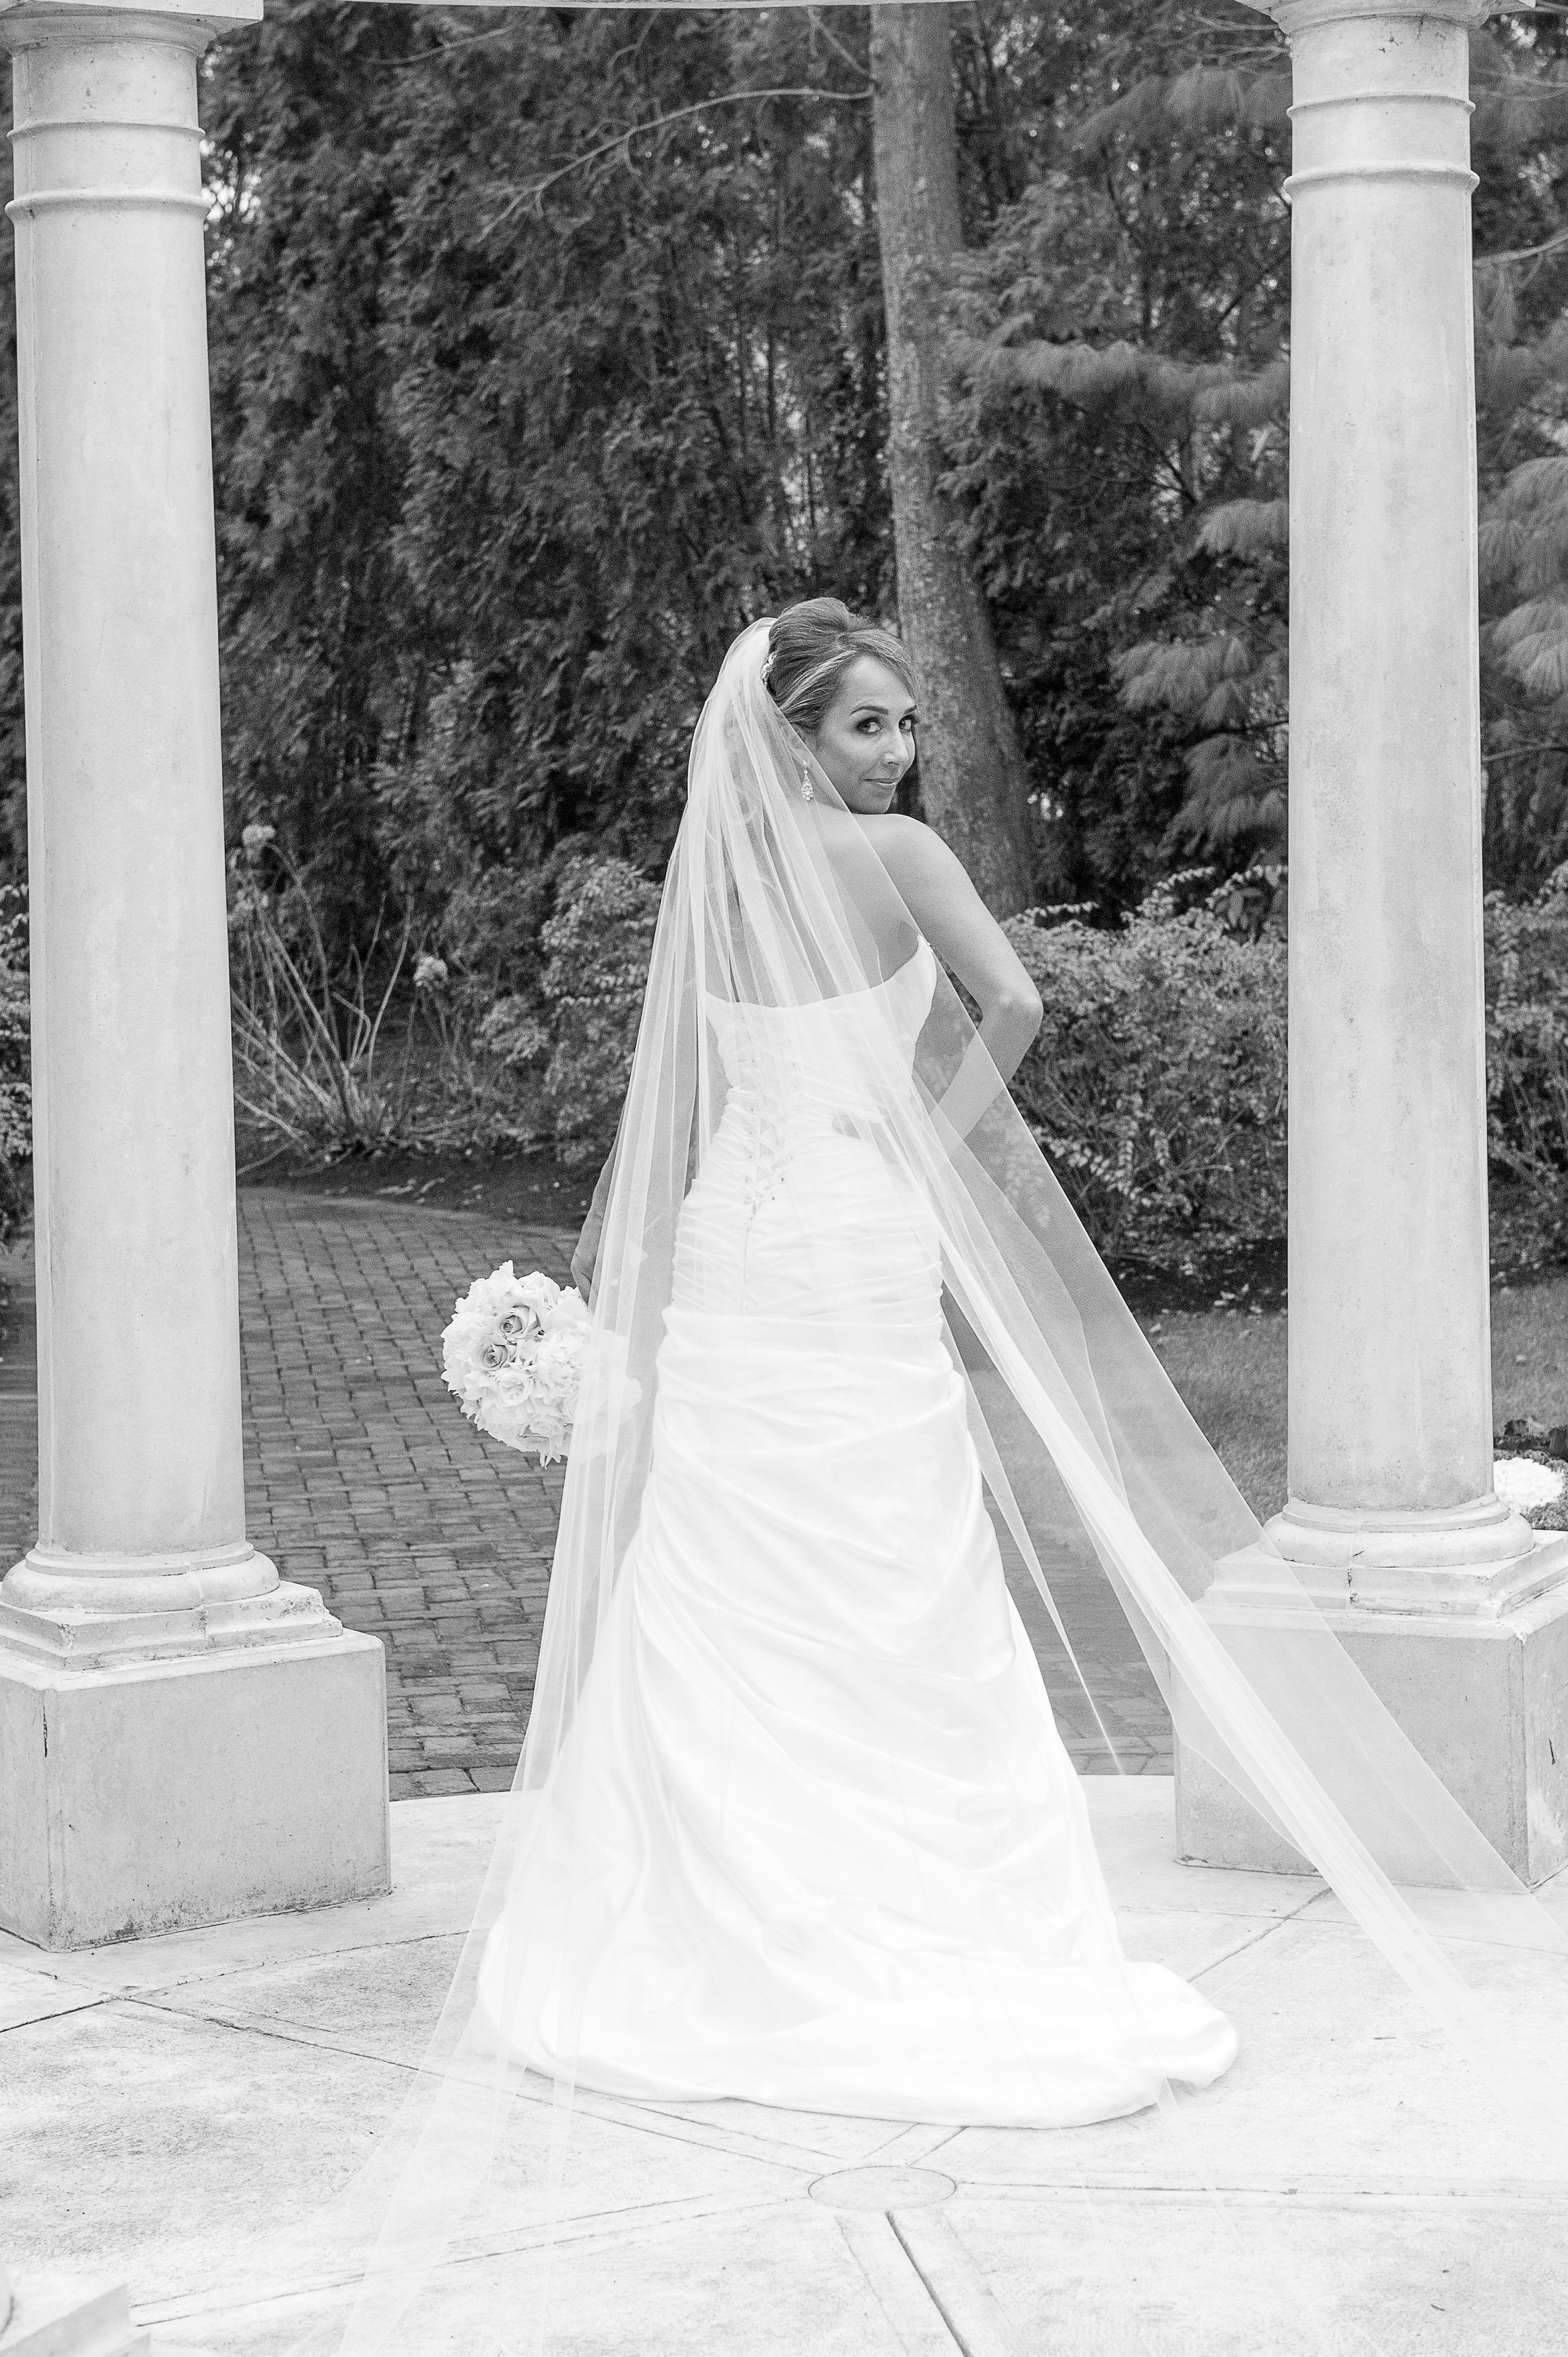 Ceci_New_York_Custom_Invitation_ New_Jersey_Wedding_Luxury_Personalized_Ceci_Style_Bride_Foil_Stamping85.JPG